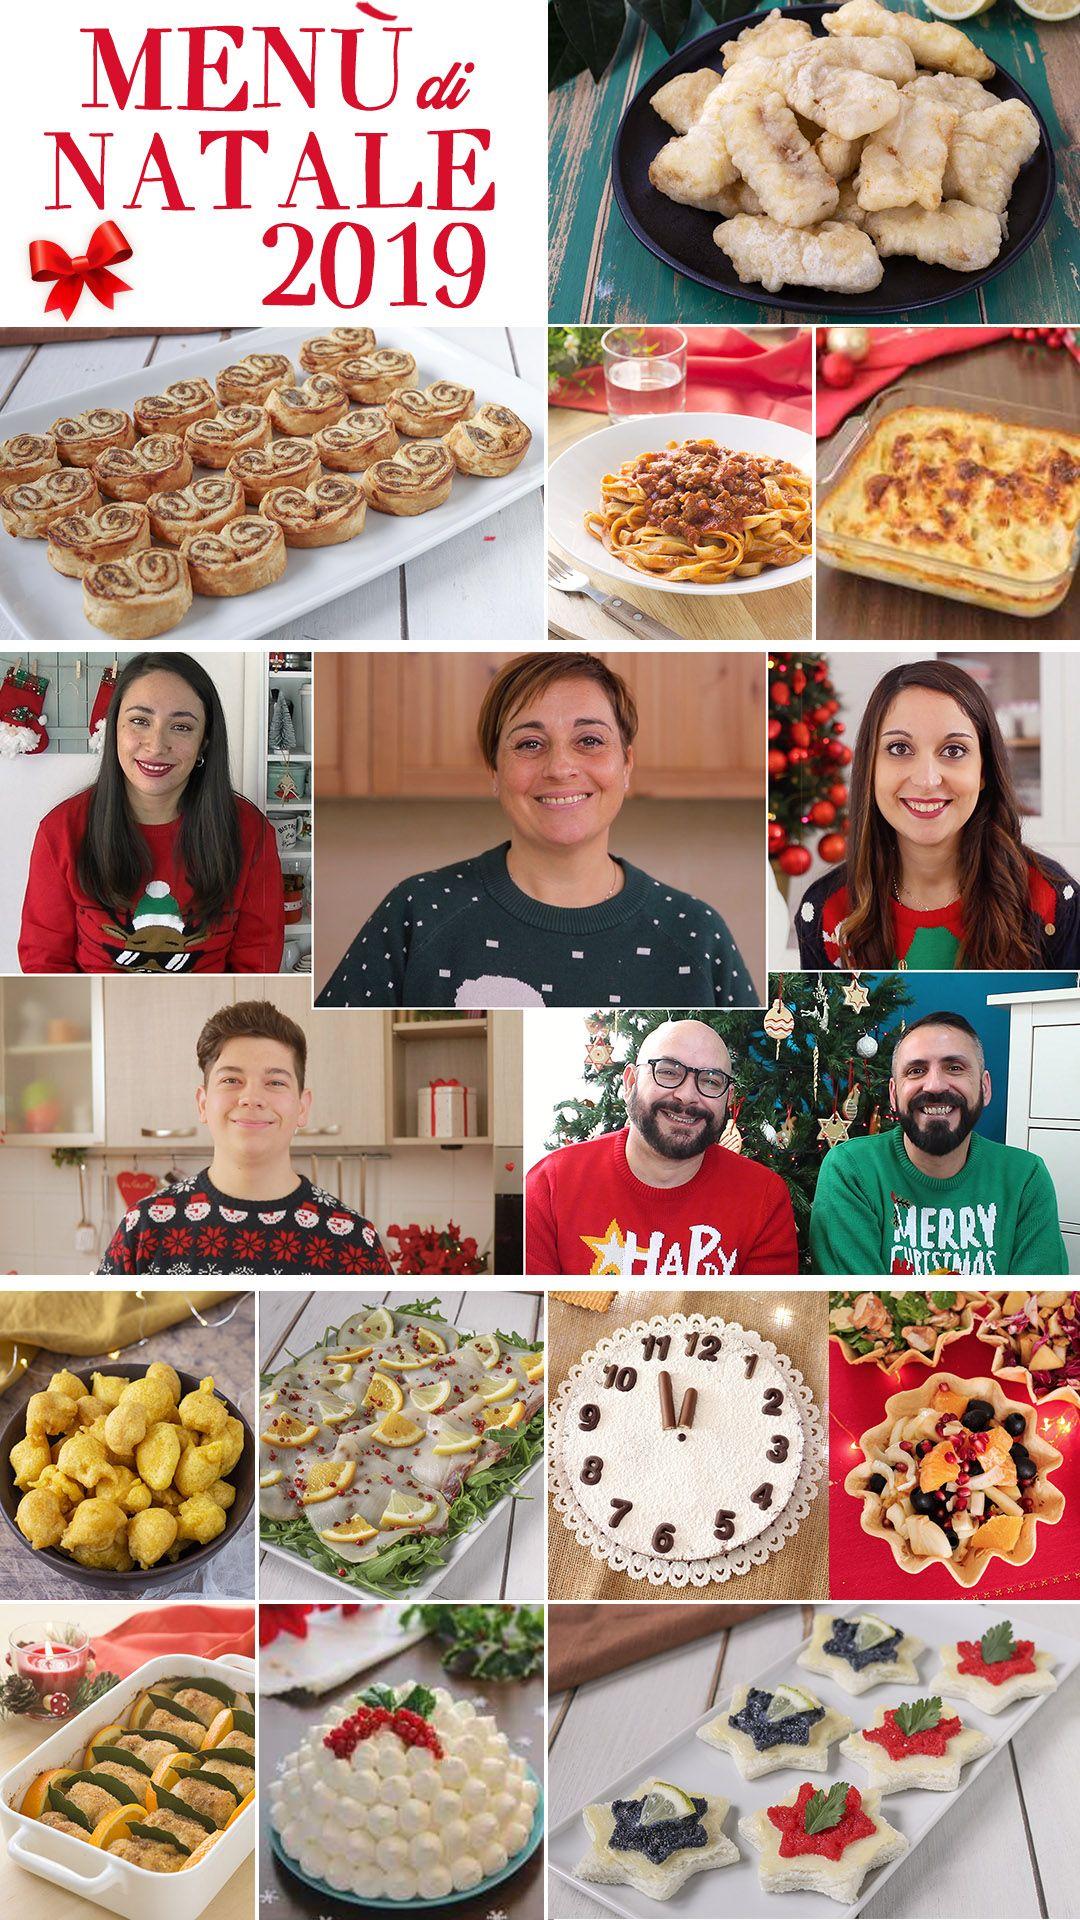 I Menu Di Benedetta Natale.Menu Di Natale 2019 Ricette Cibo Per Feste Antipasti Di Natale